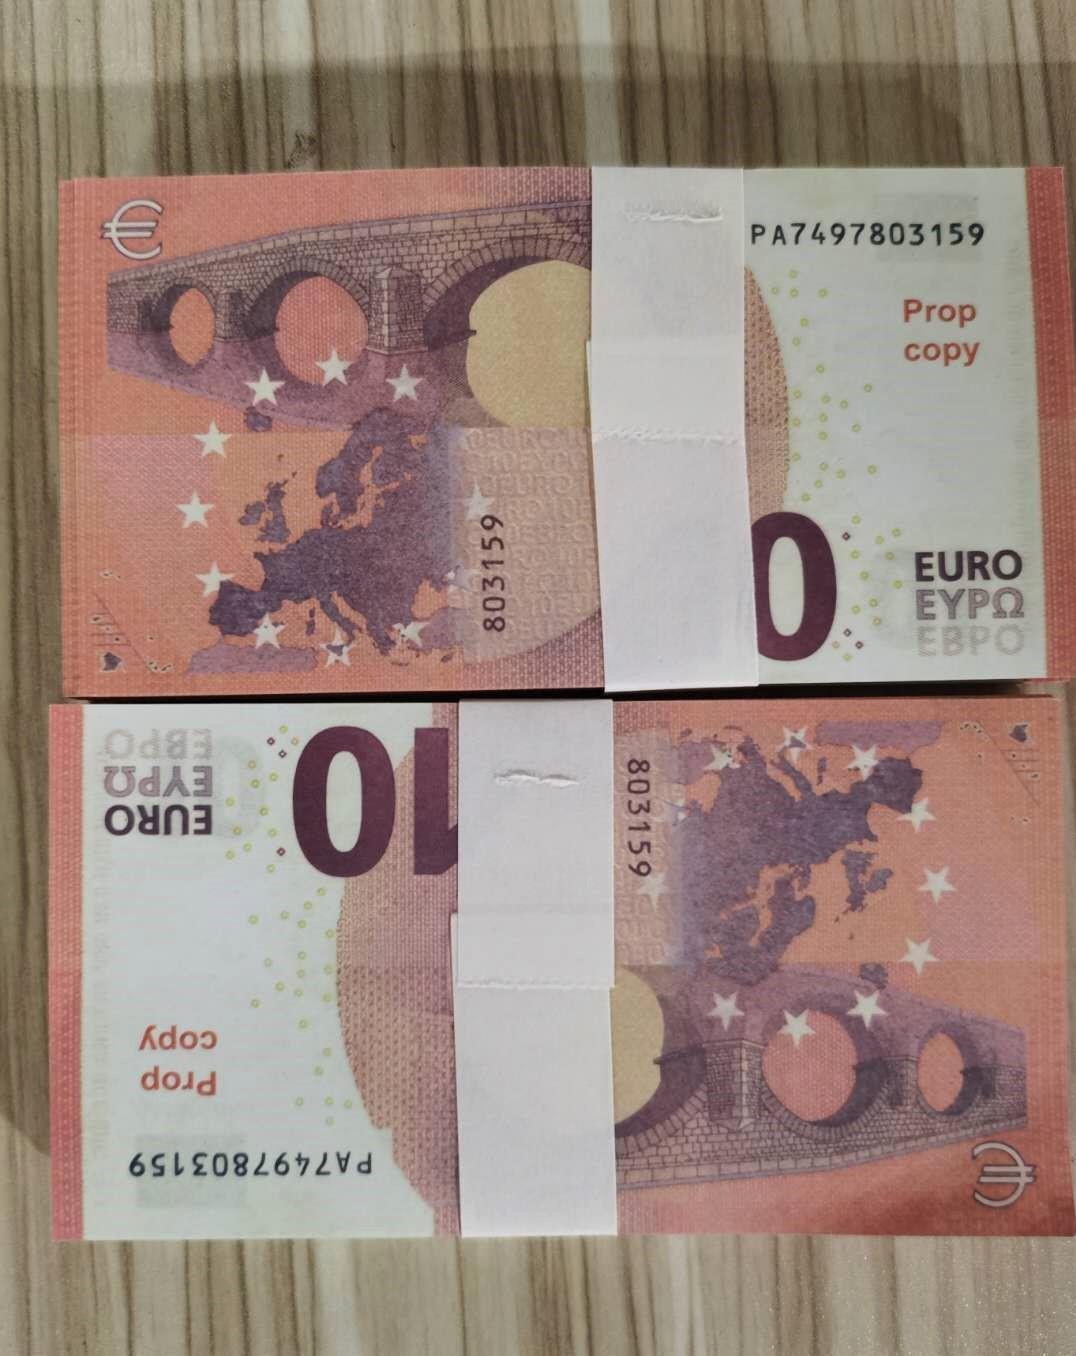 Heiße Verkäufe Nachtclub Bar Games Pretend Prop-Geld-Kopie Banknote Faux Billet-Filme 10, 200, 50 Euro 100pcs / Pack E1250